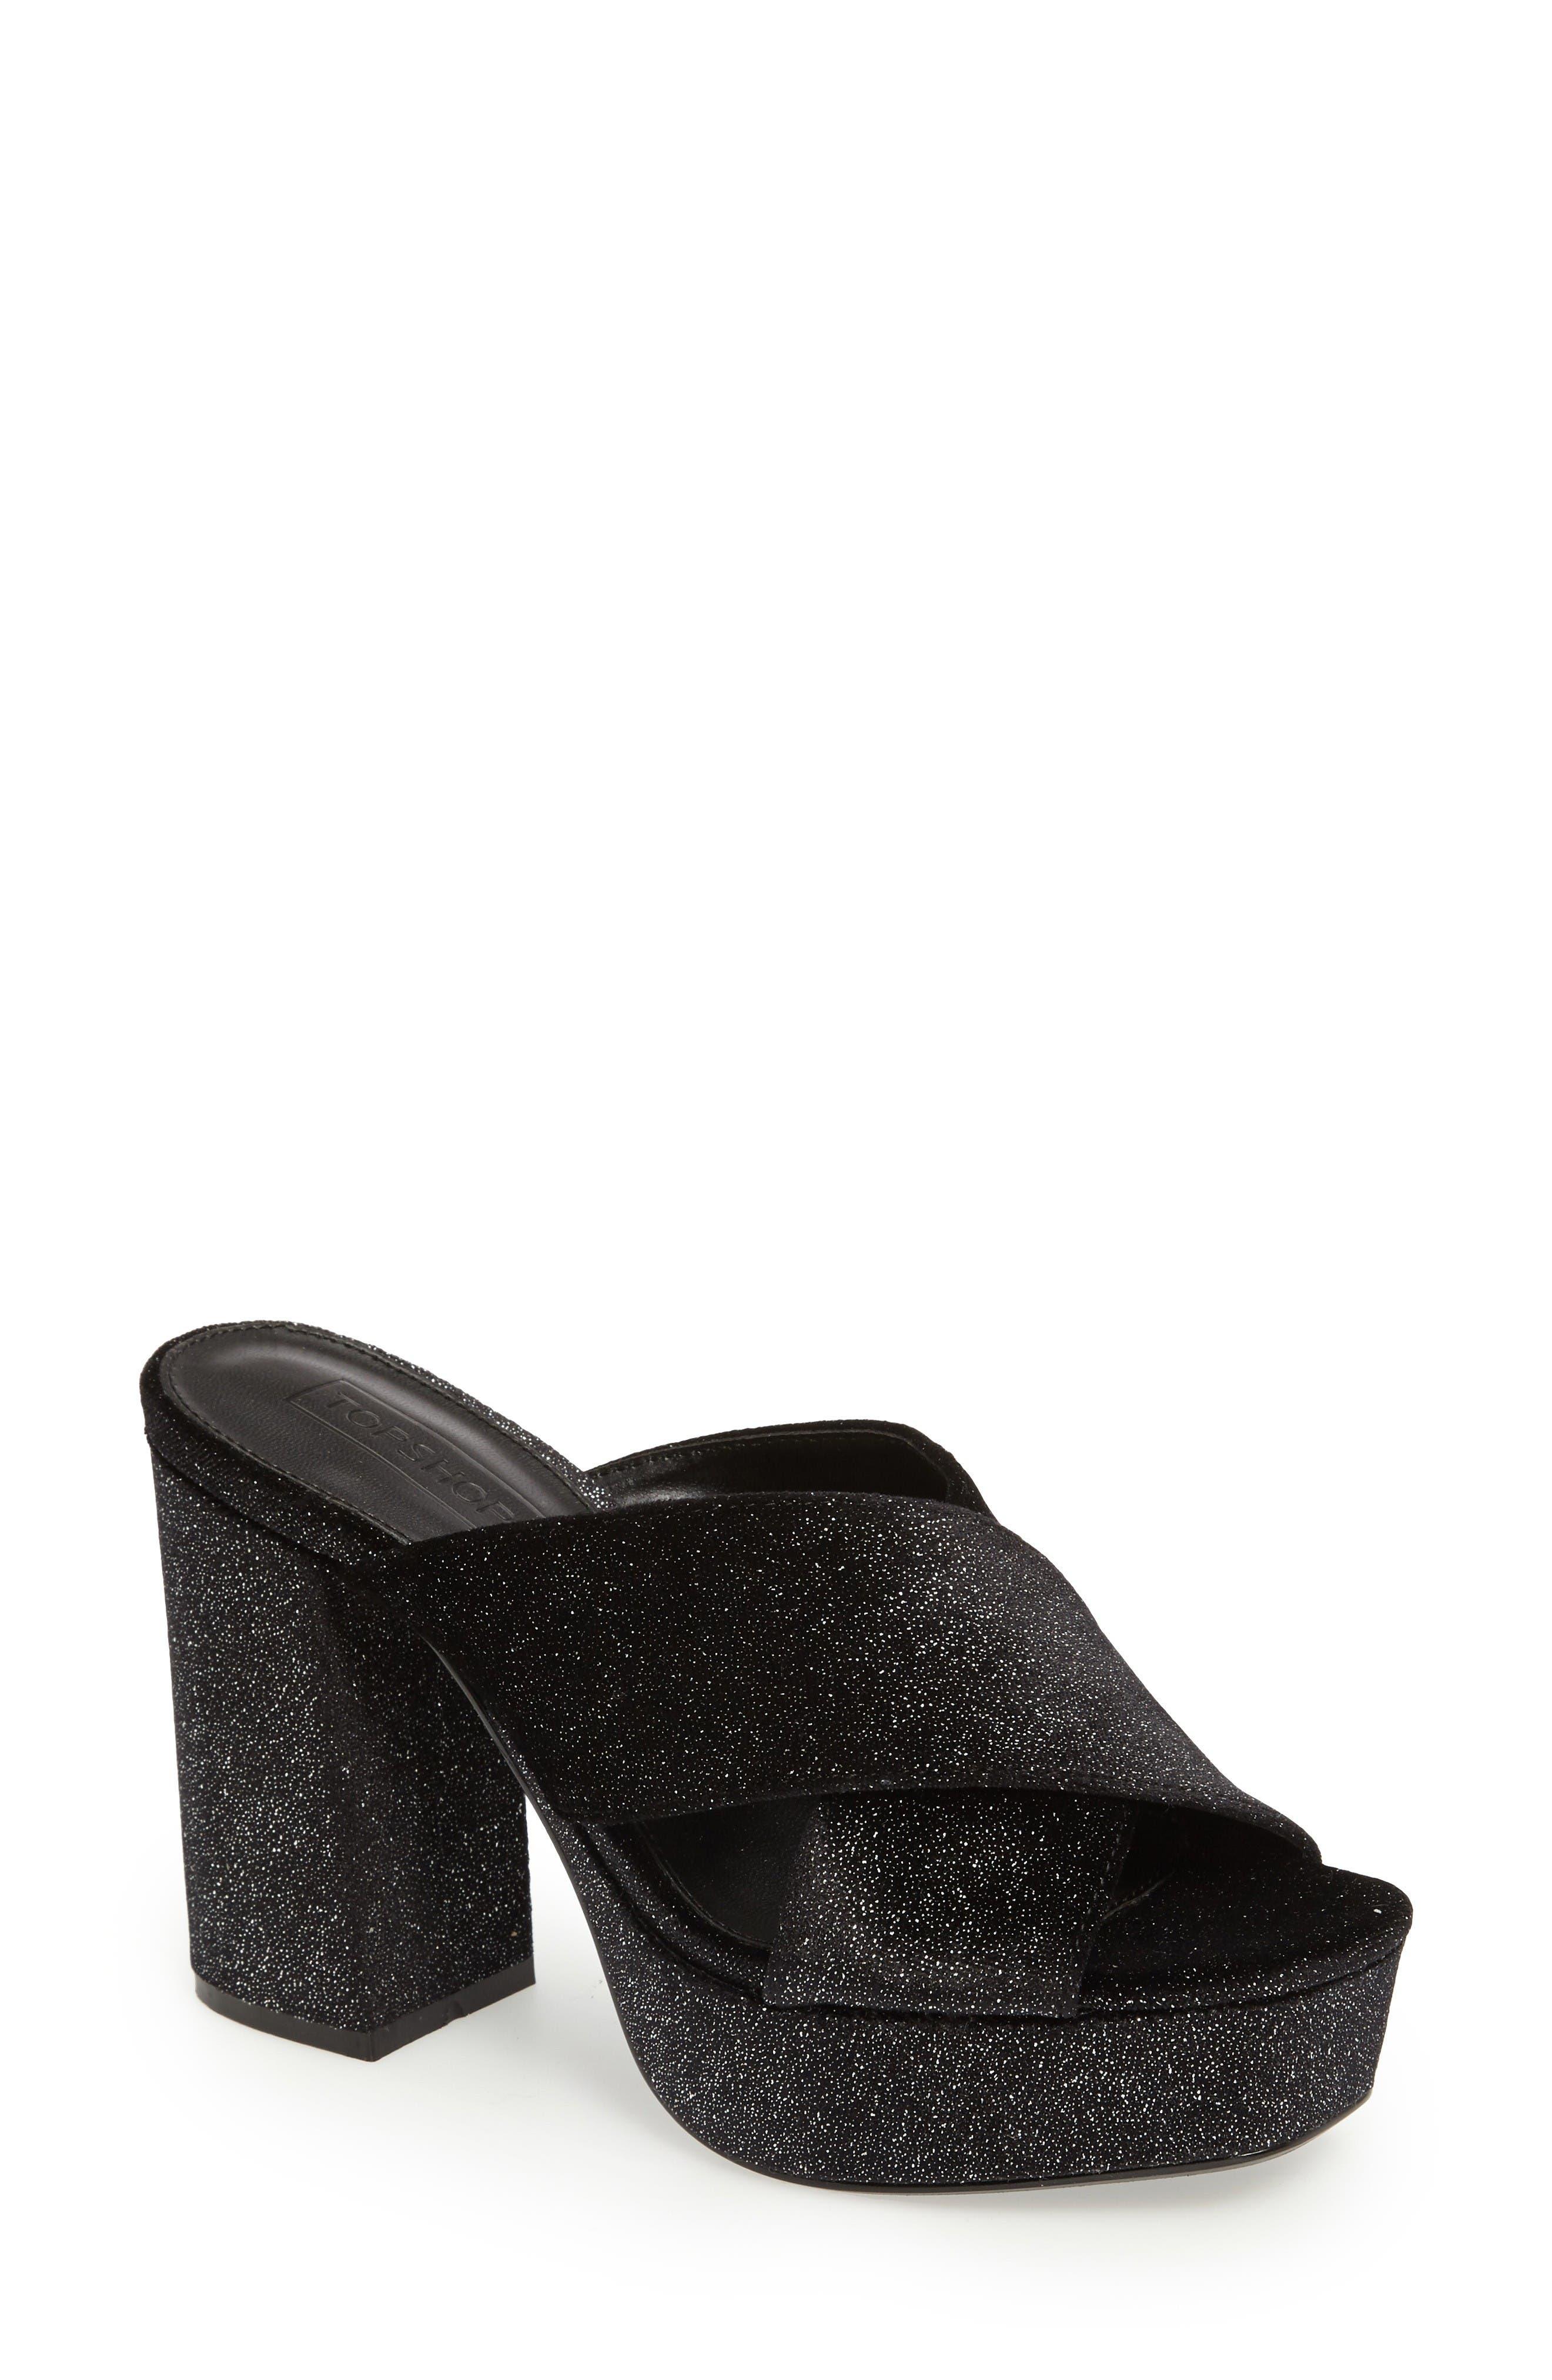 Alternate Image 1 Selected - Topshop Miss X Platform Sandal (Women)